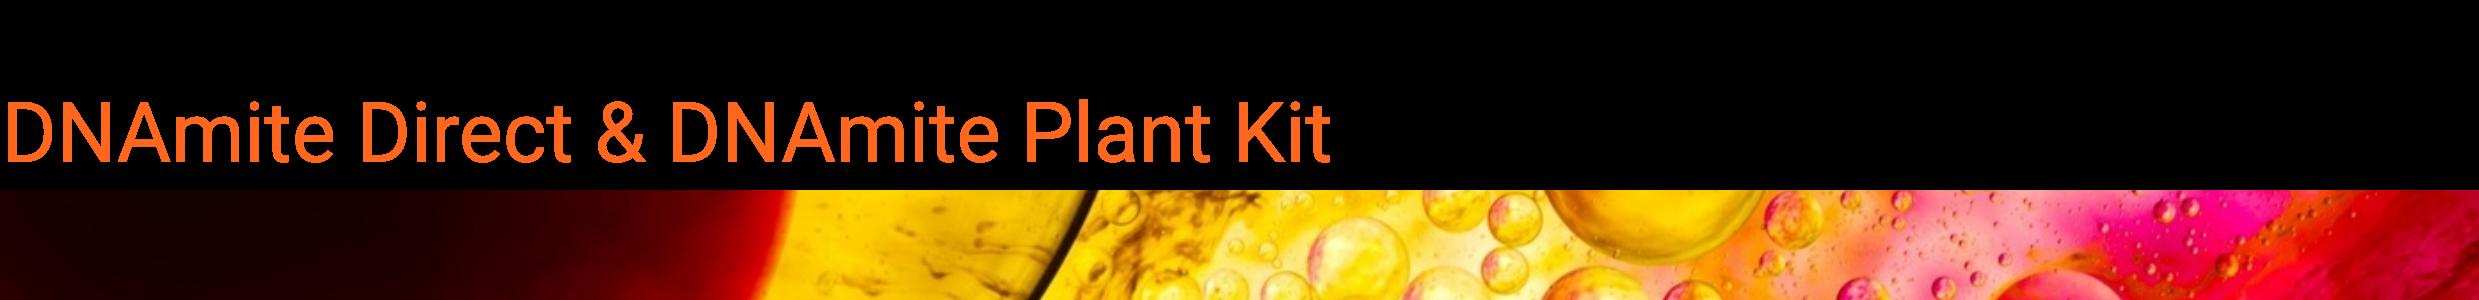 dnamite direct & plant kit